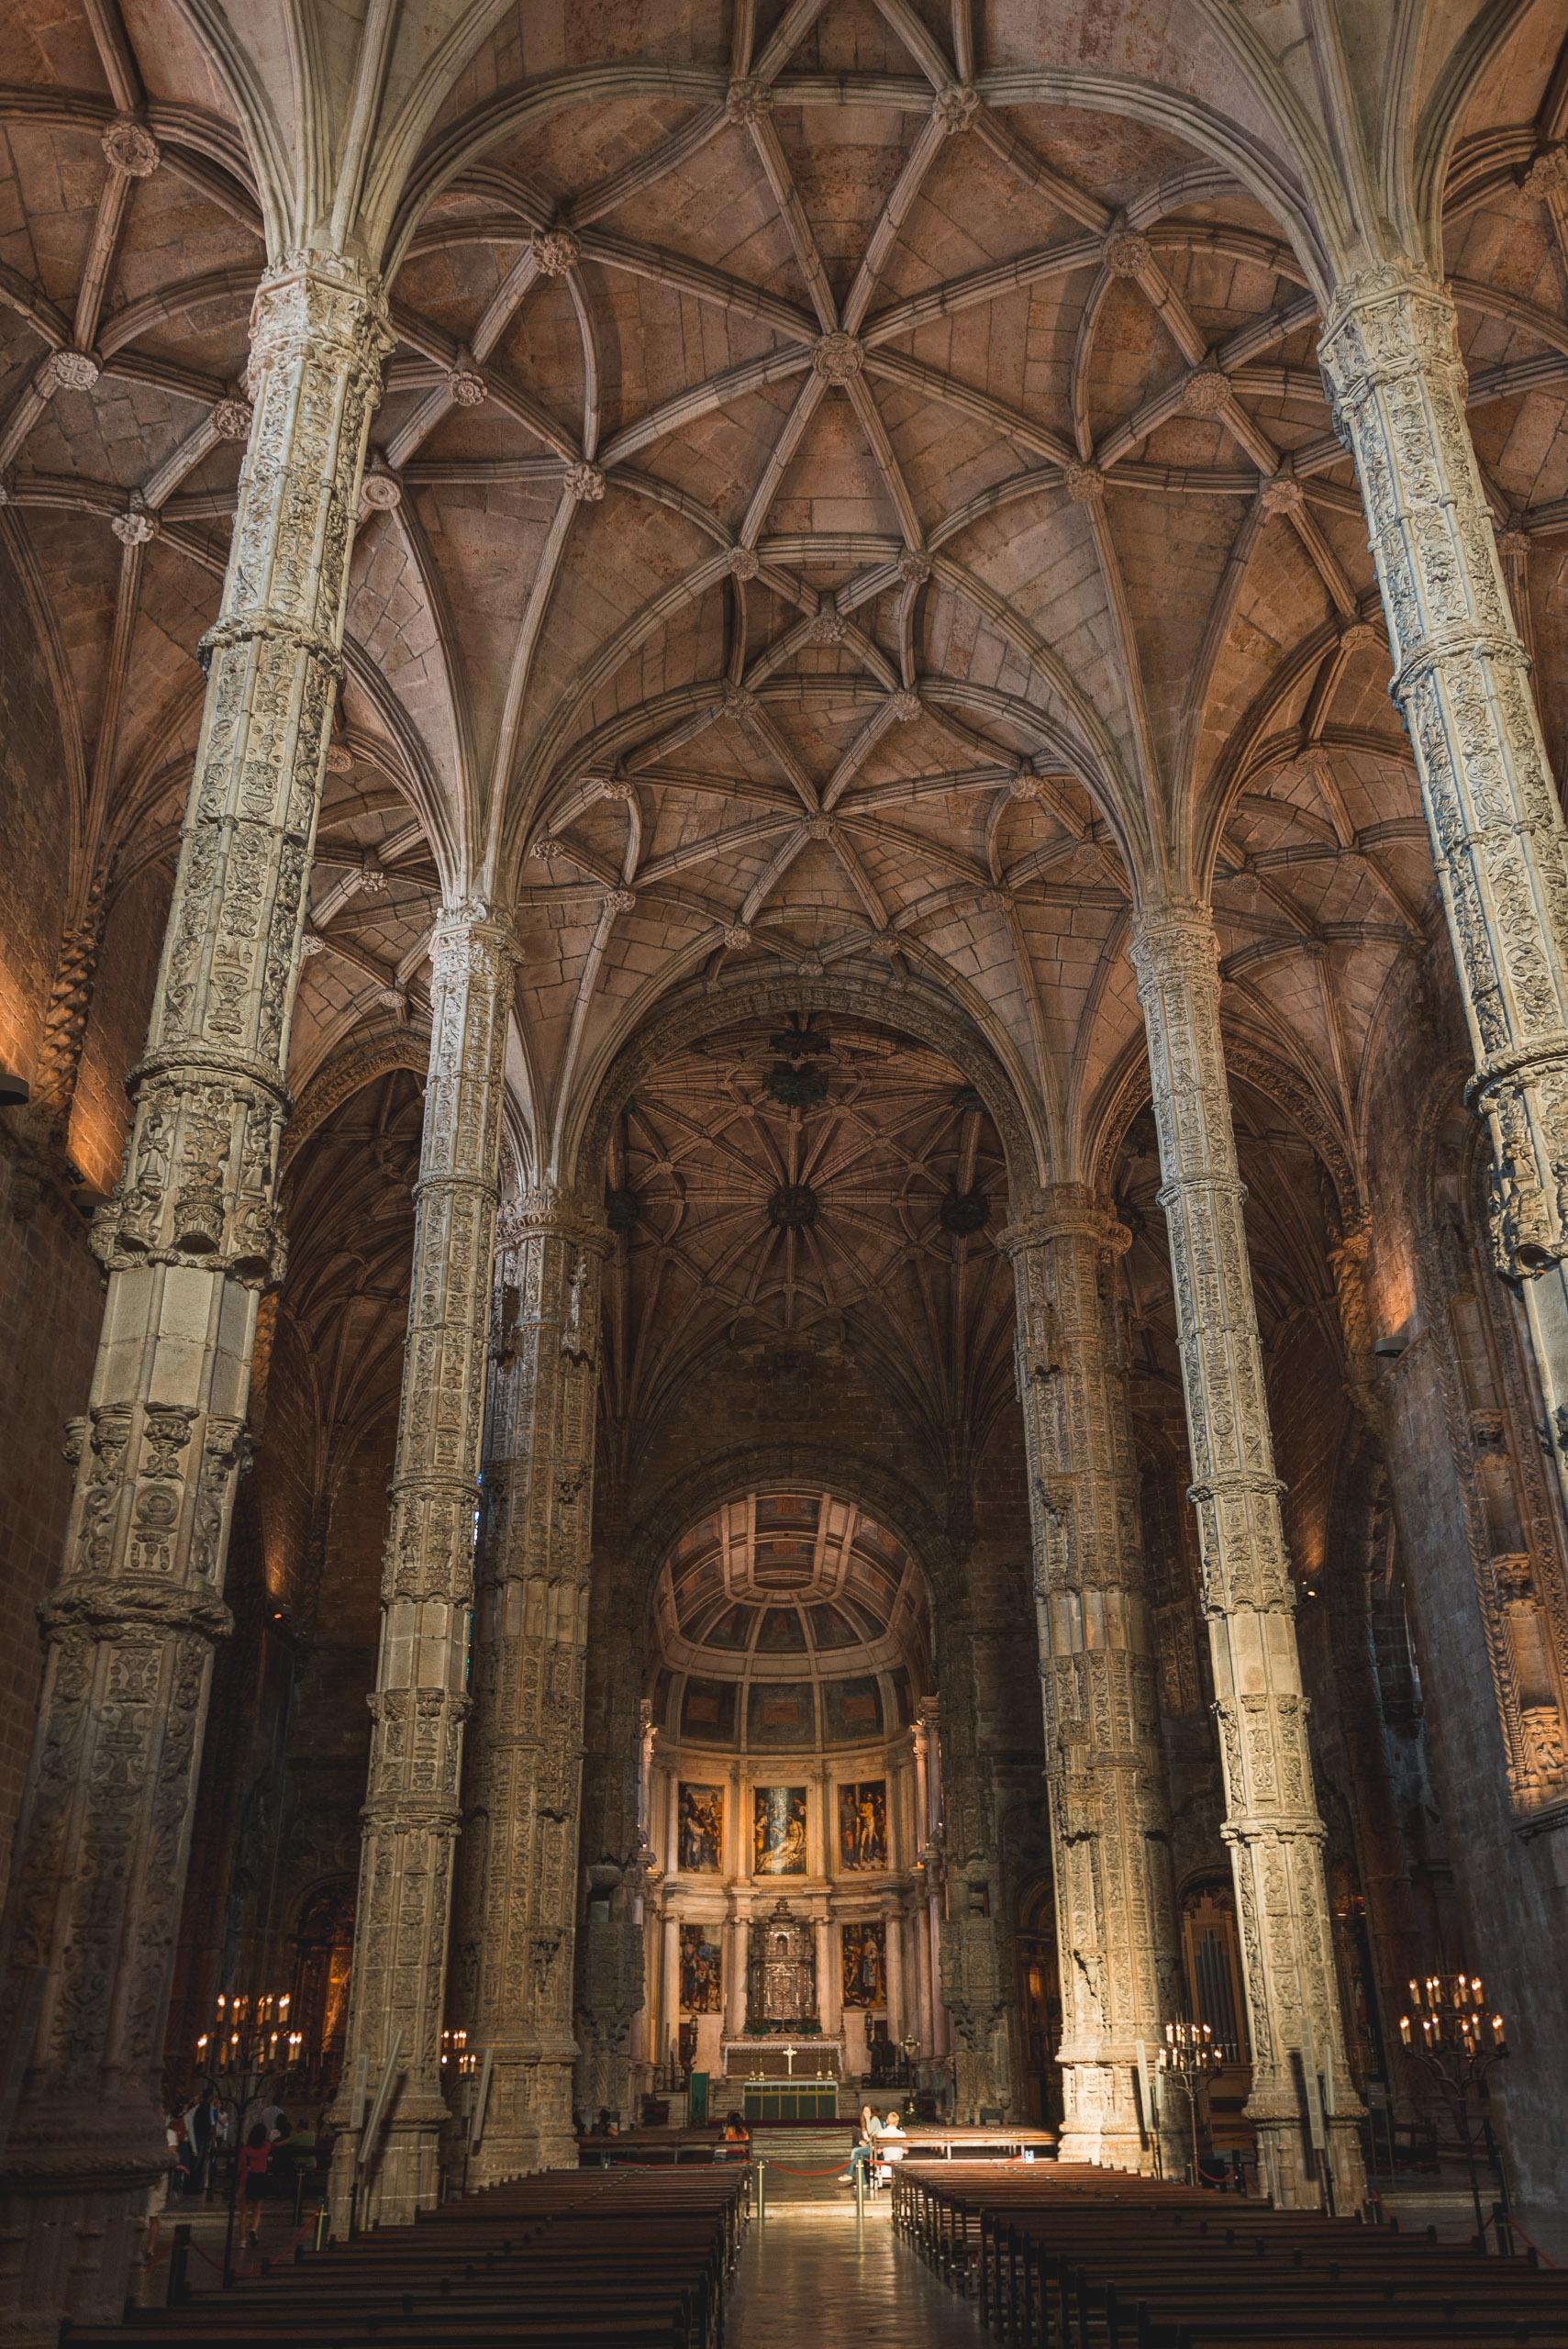 Portugal - Lisbon - 2012-0923-DSC_1602_33897